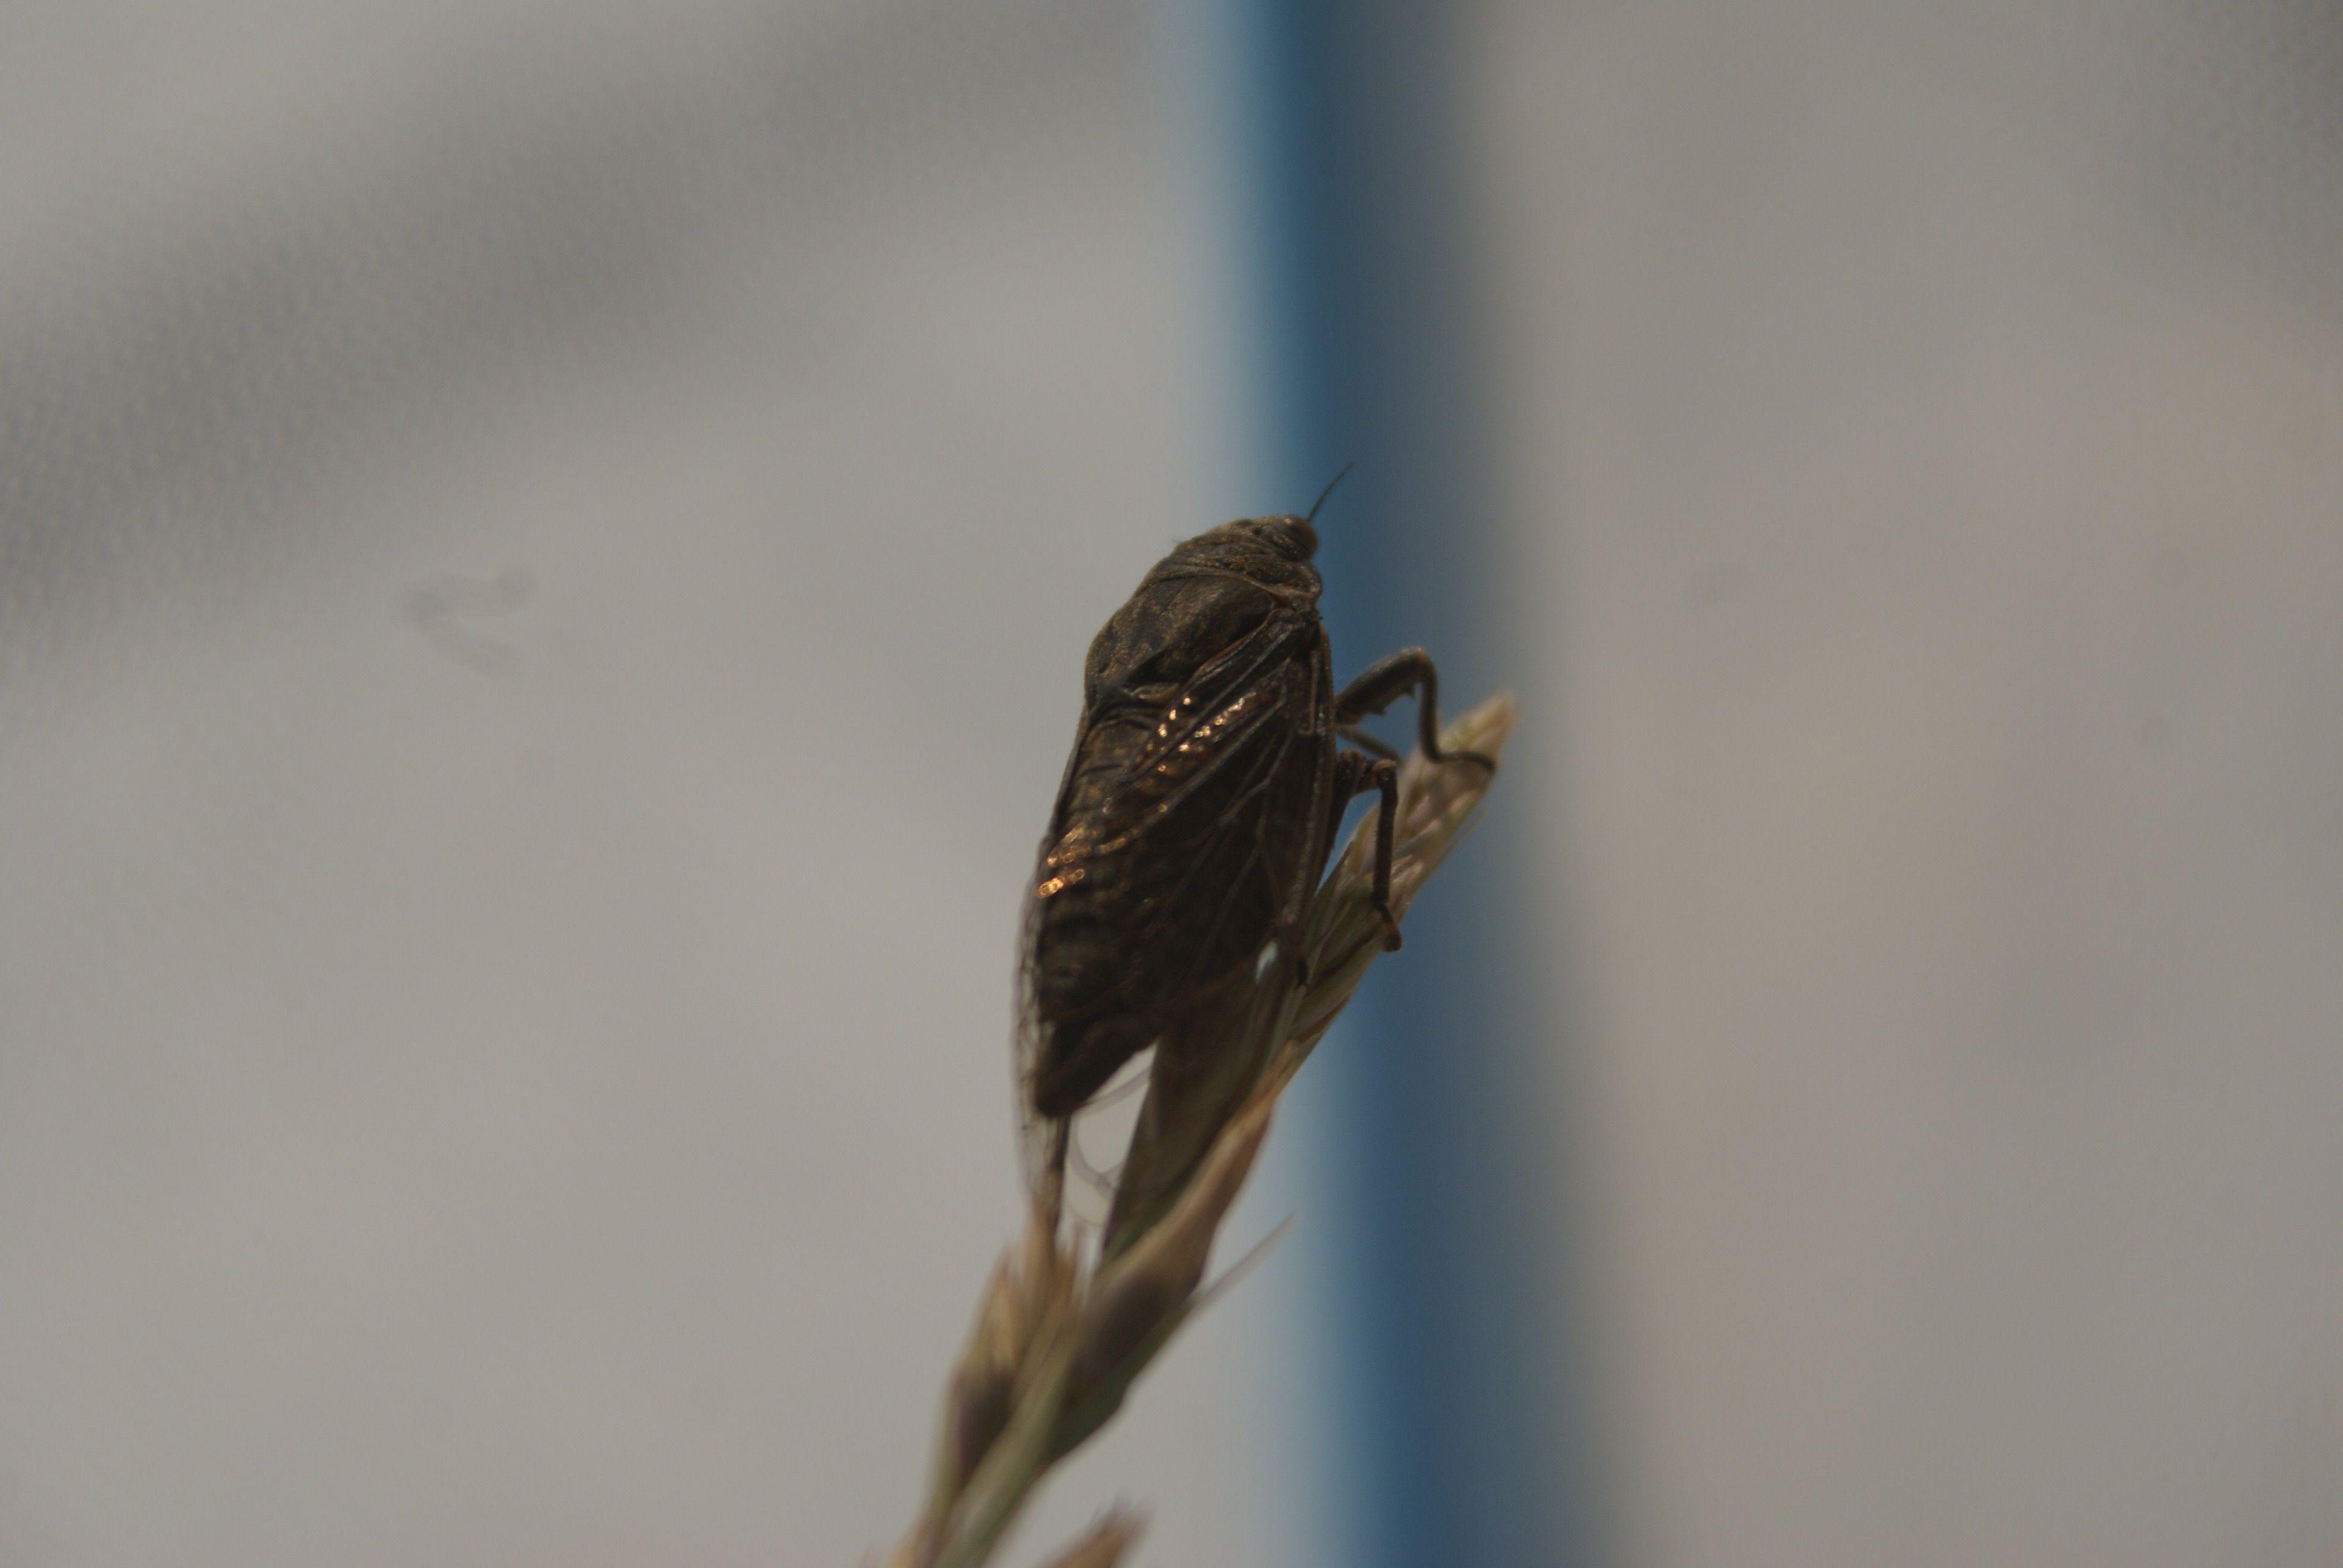 Tibicinoides cupreosparsus: day2